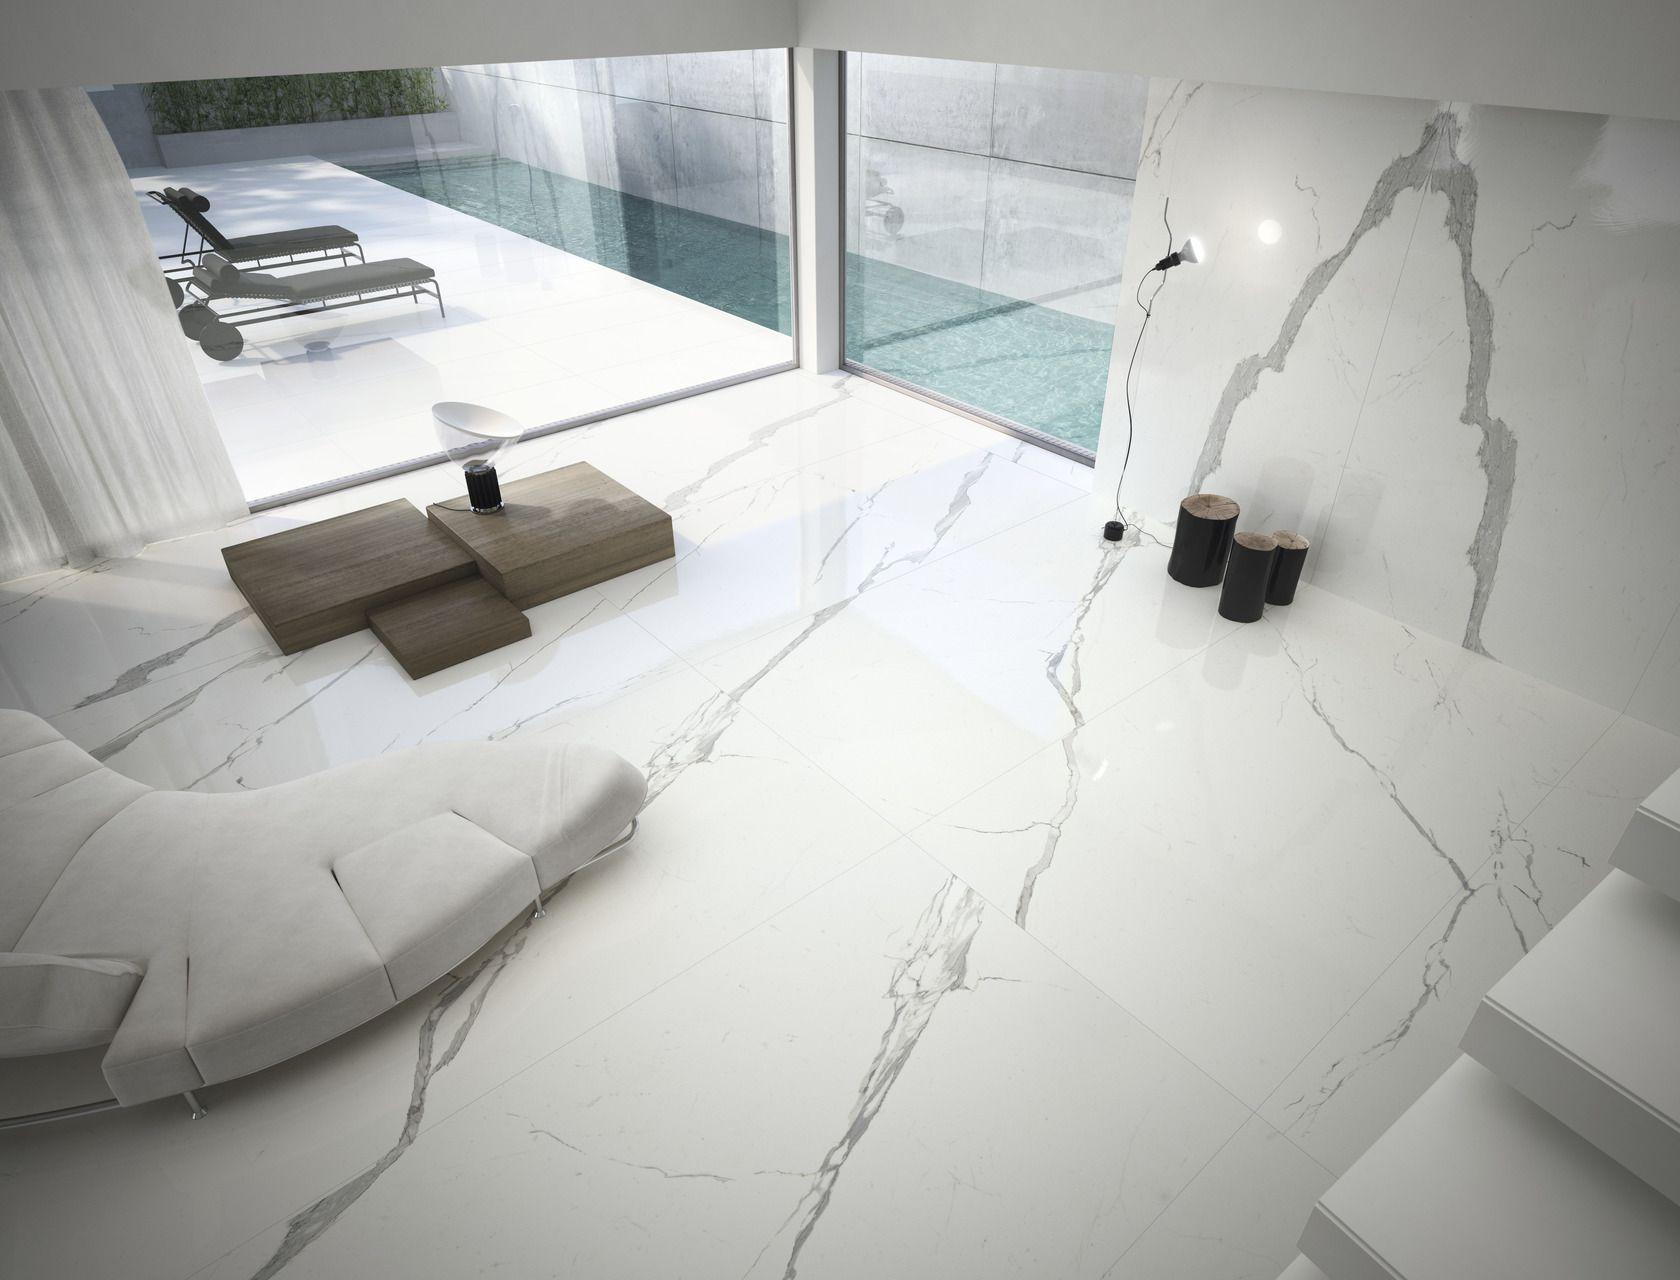 Ultra Marmi Statuario Altissimo Large Format Tile Wall And Floor Tiles Tiles Uk